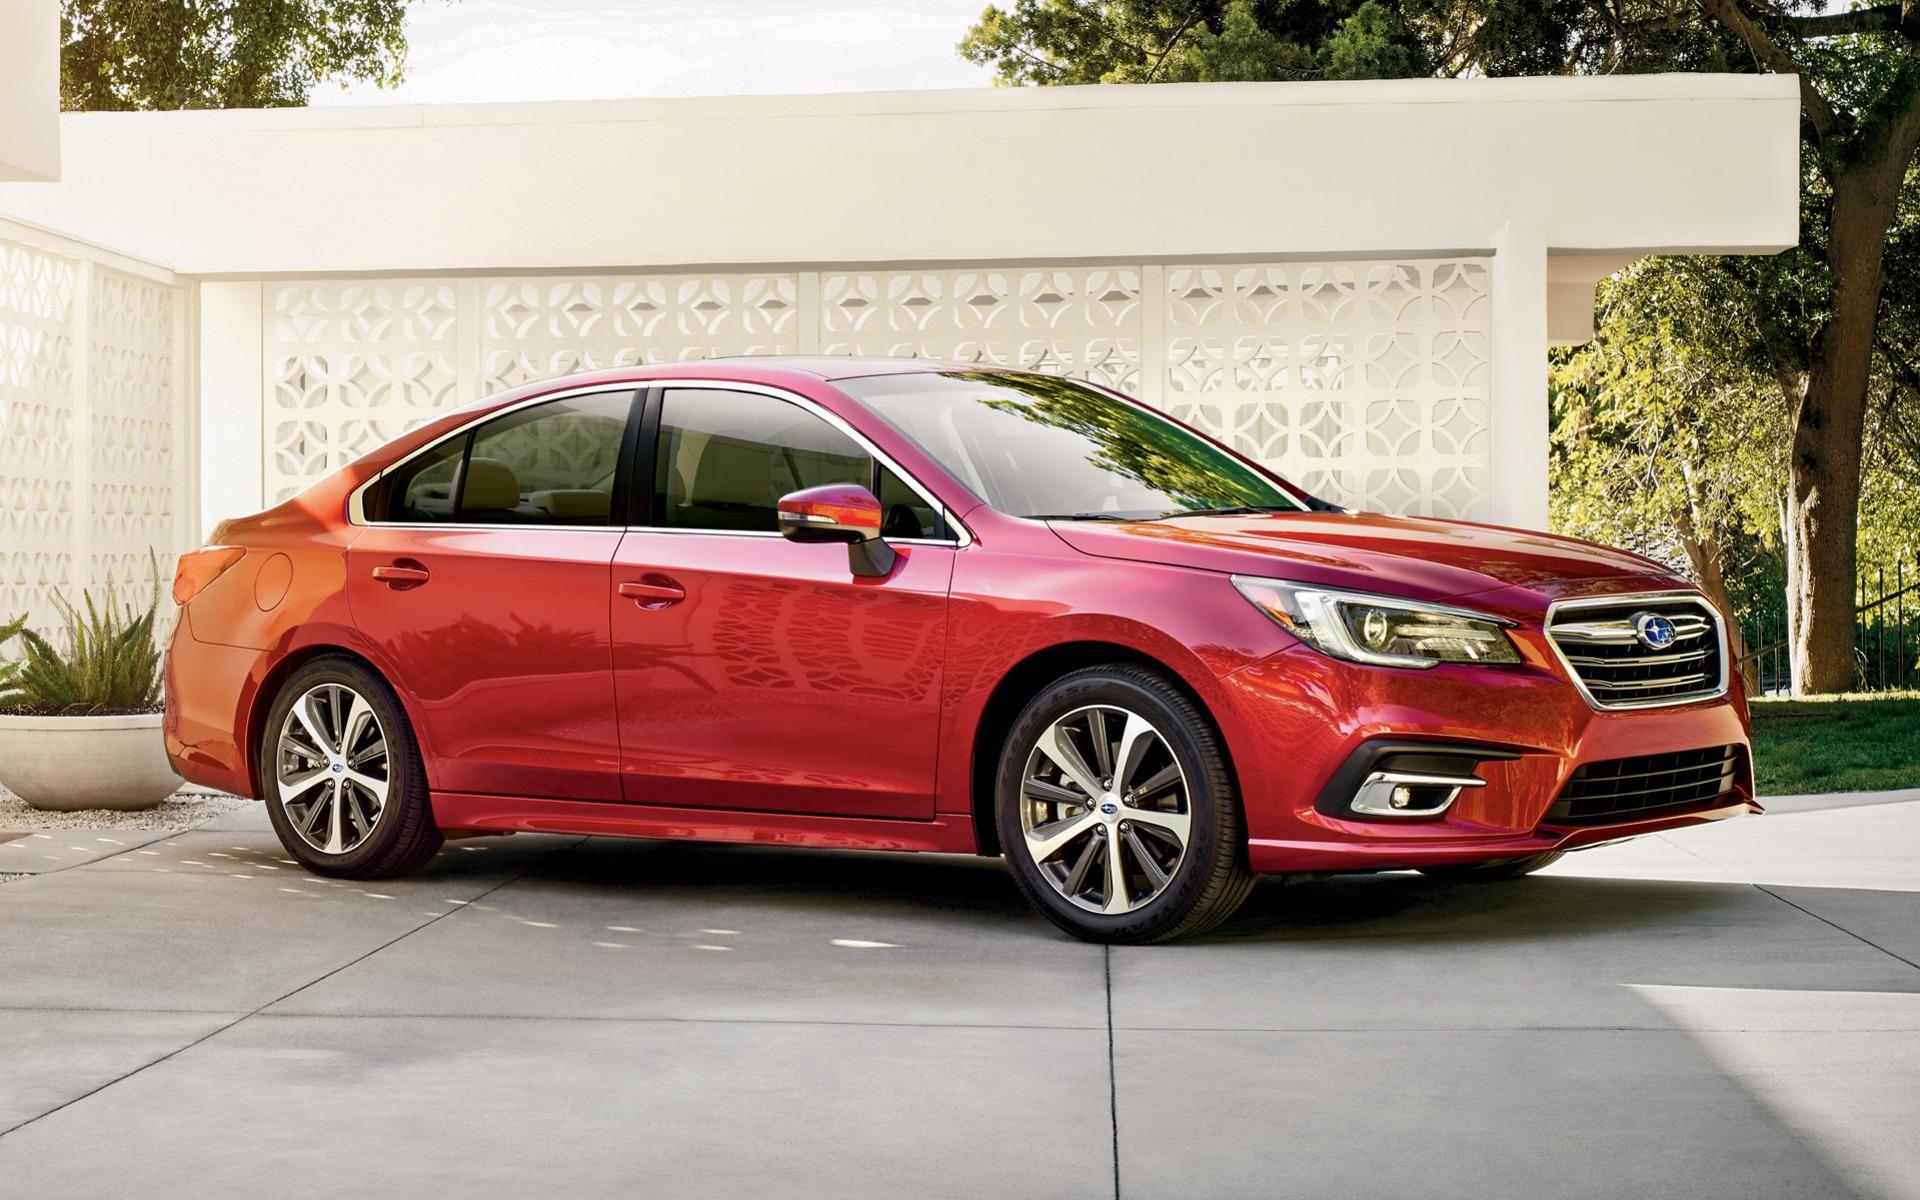 Subaru Legacy 2019 : cinq choses à savoir 361692_2019_Subaru_Legacy